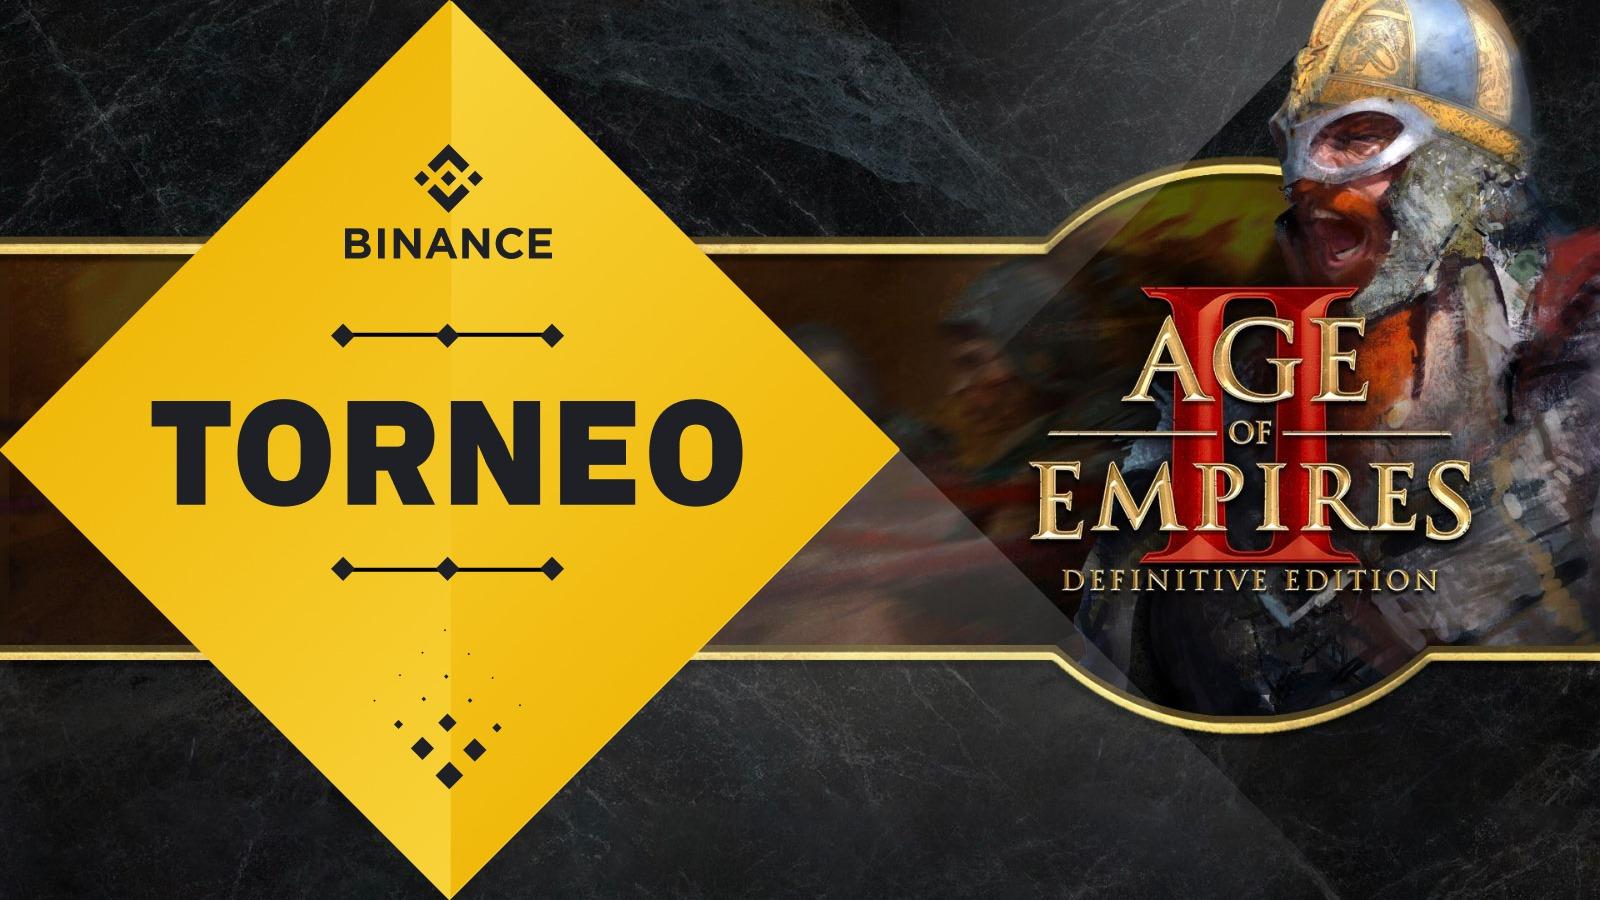 binance age of empires criptotendencias.com